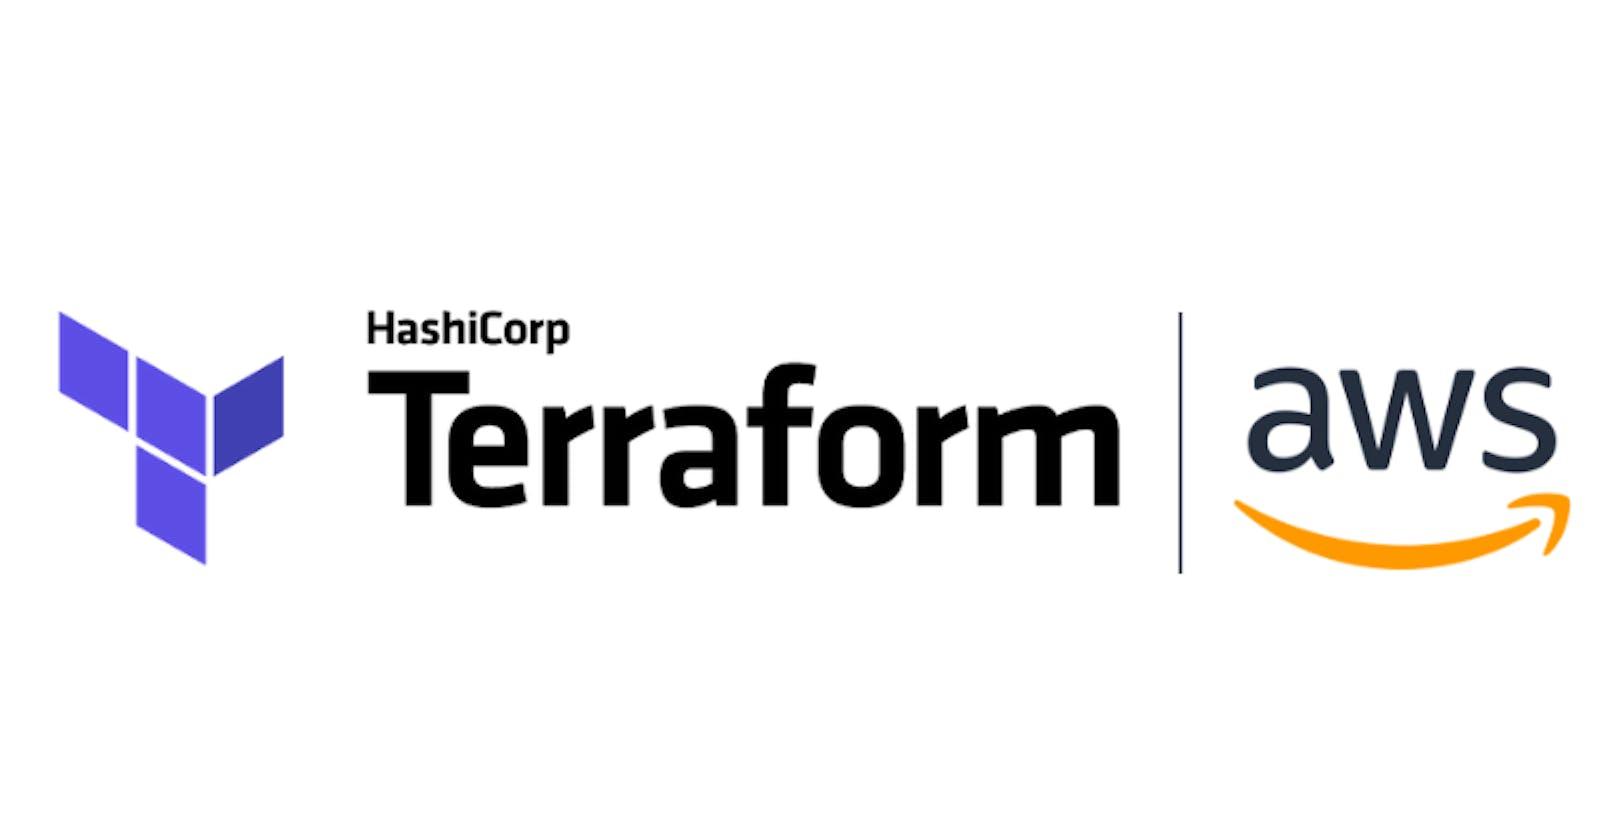 Practical CI/CD  Guide to Deploying AWS Infrastructure through Terraform - Multi Environment Deployment - Part 1